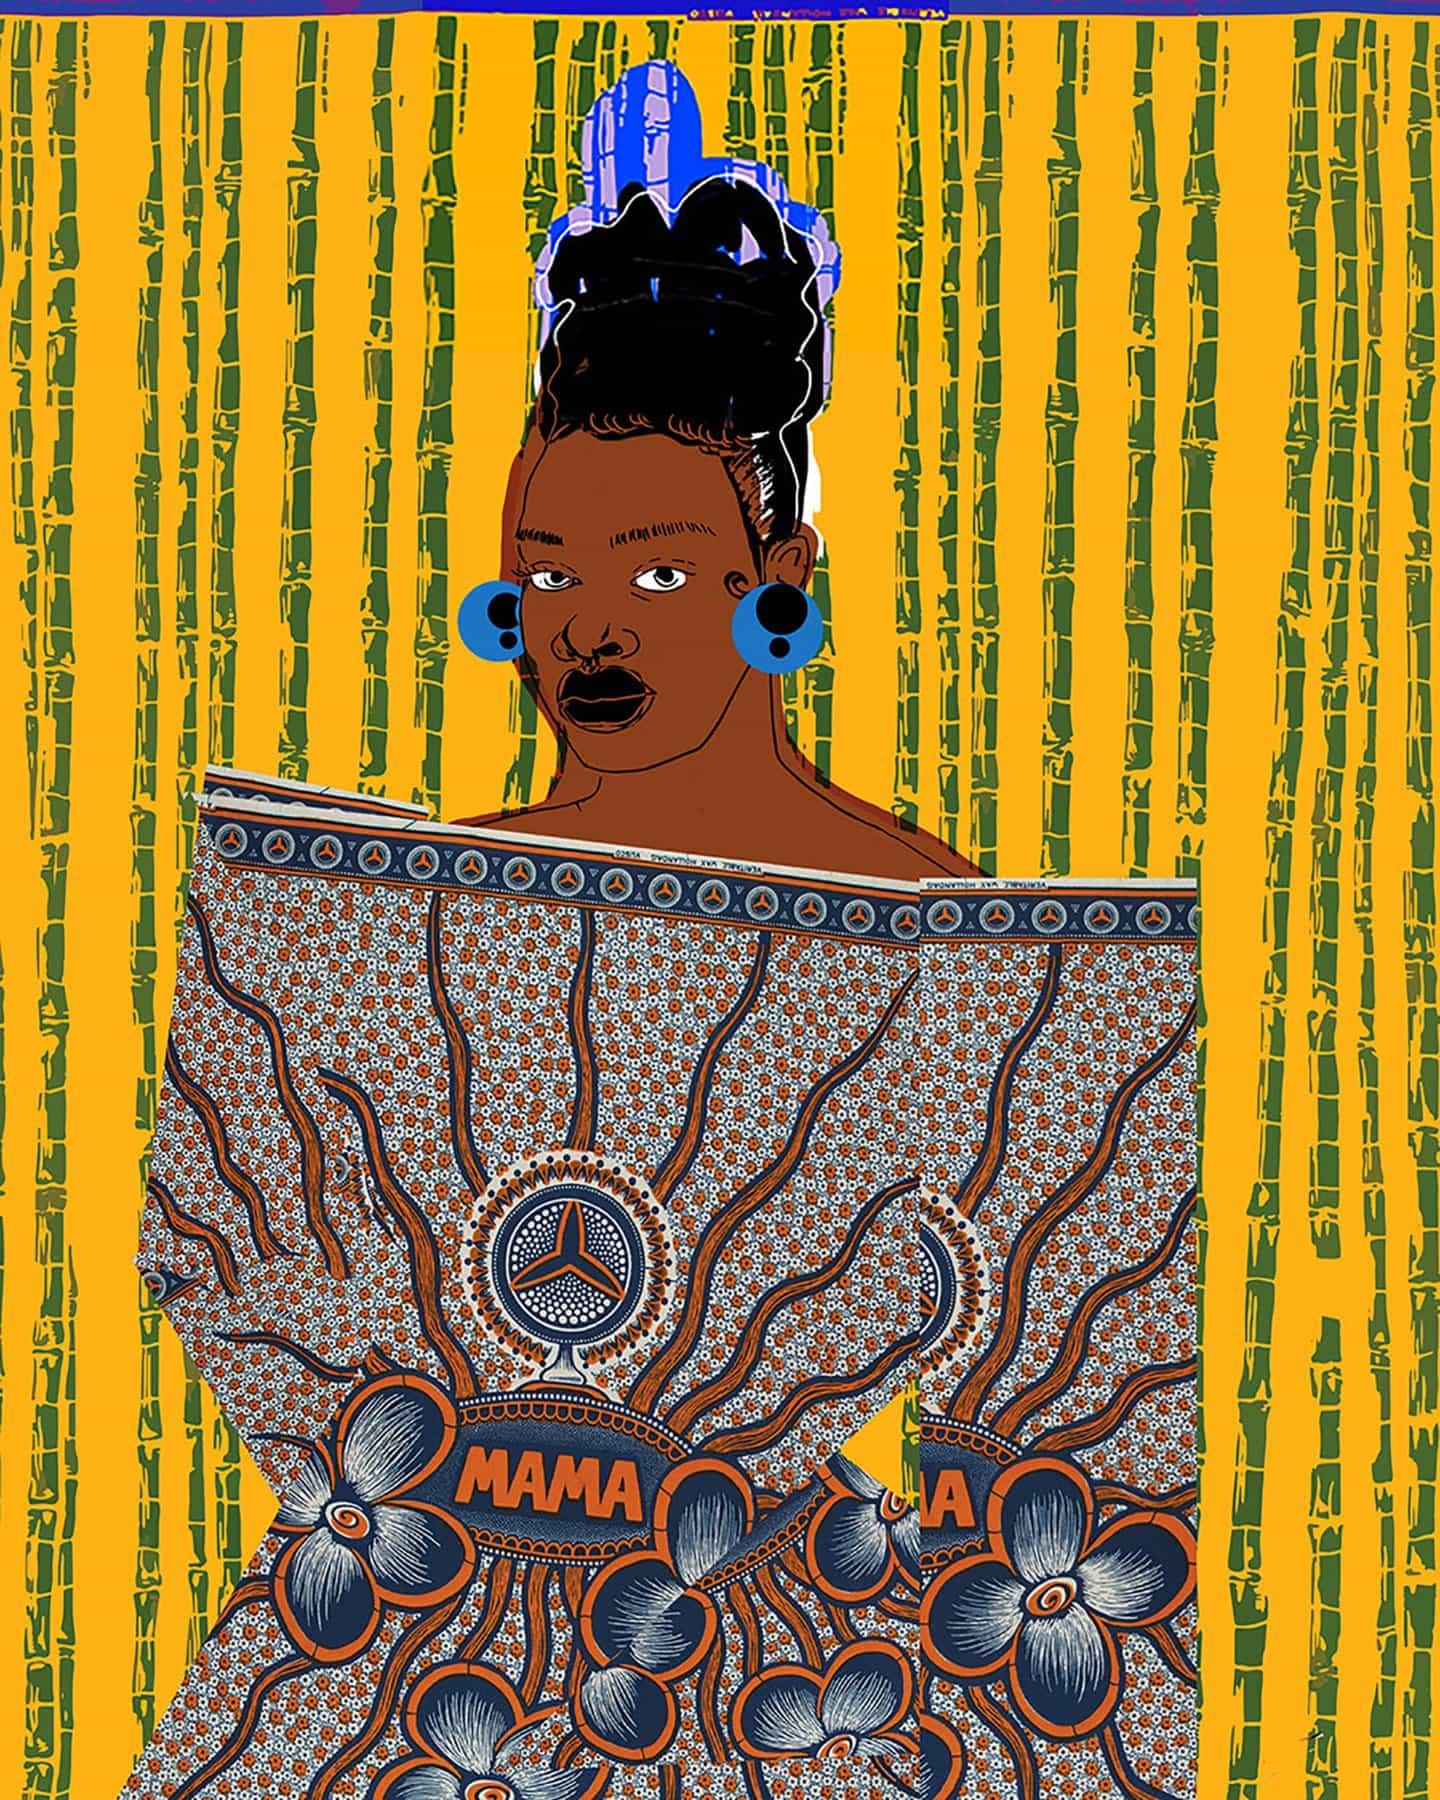 Ngadi Smart: Ilustraciones de moda marfileñas, para Vlisco&Co (Copyright © Ngadi Smart, 2021)